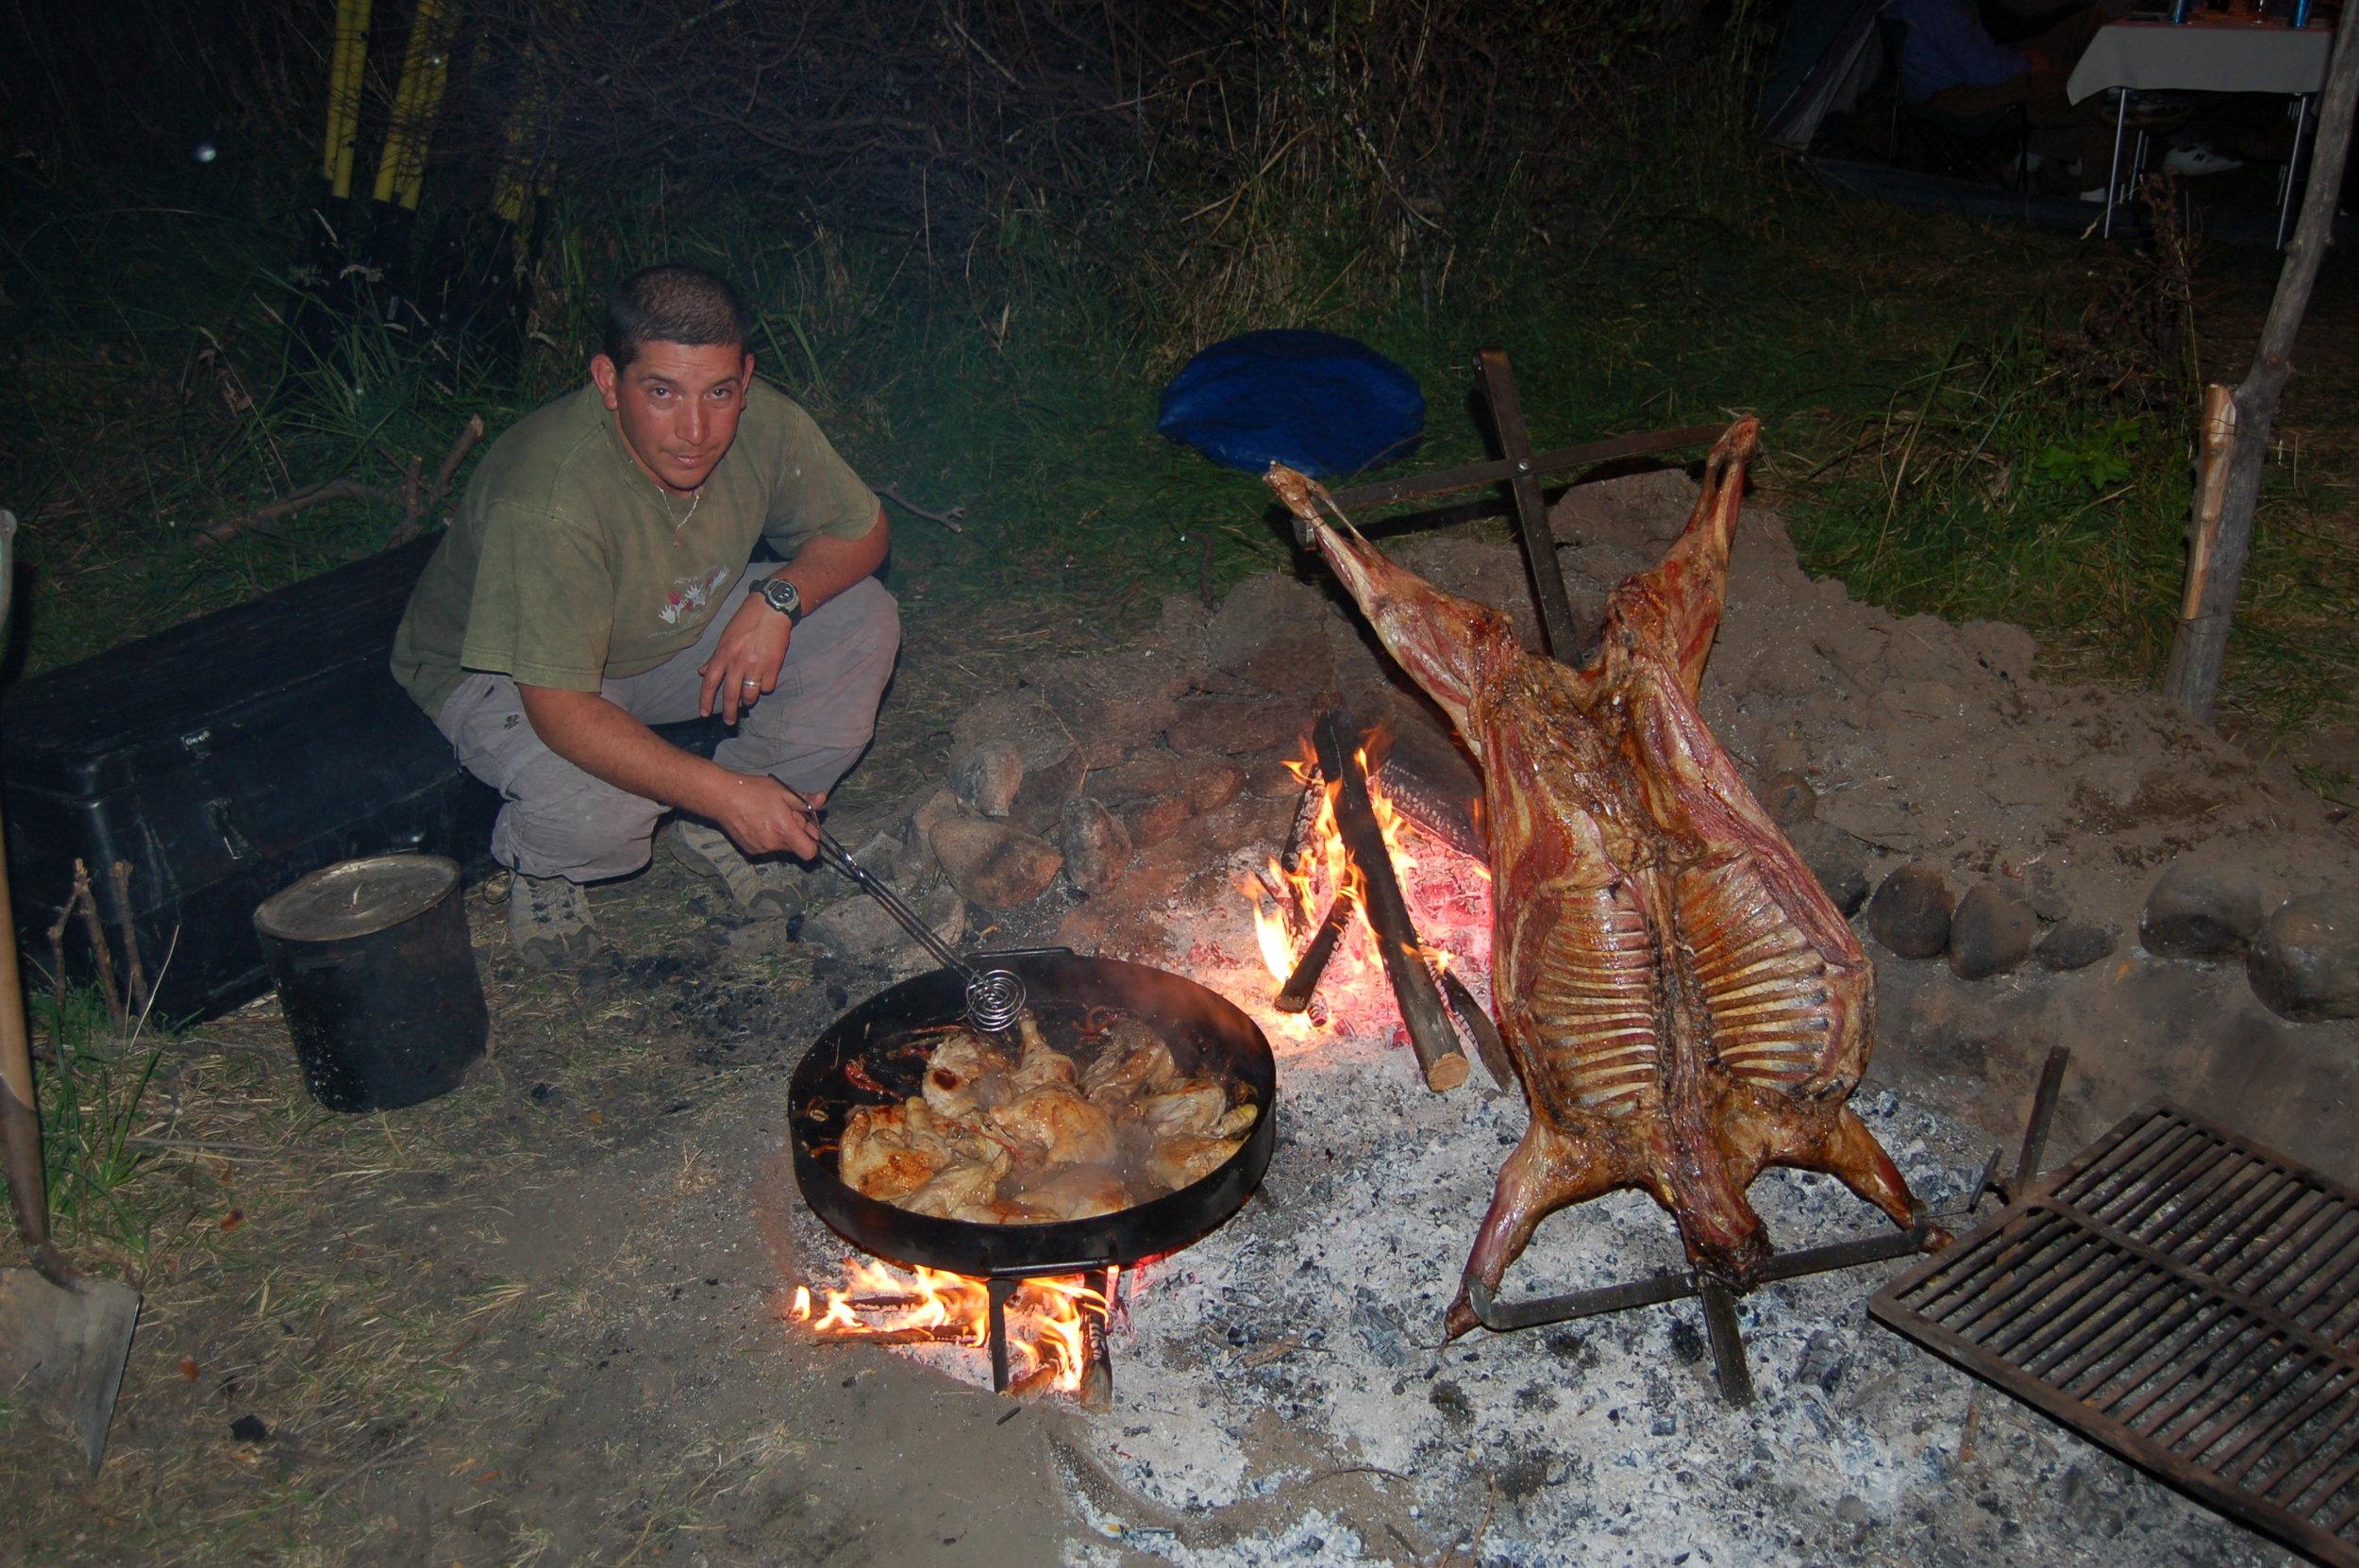 Preparing camp dinner at river side. Lamb a la cruza (on the cross) and pollo al disco (chicken seared on the disk). Fabulous!